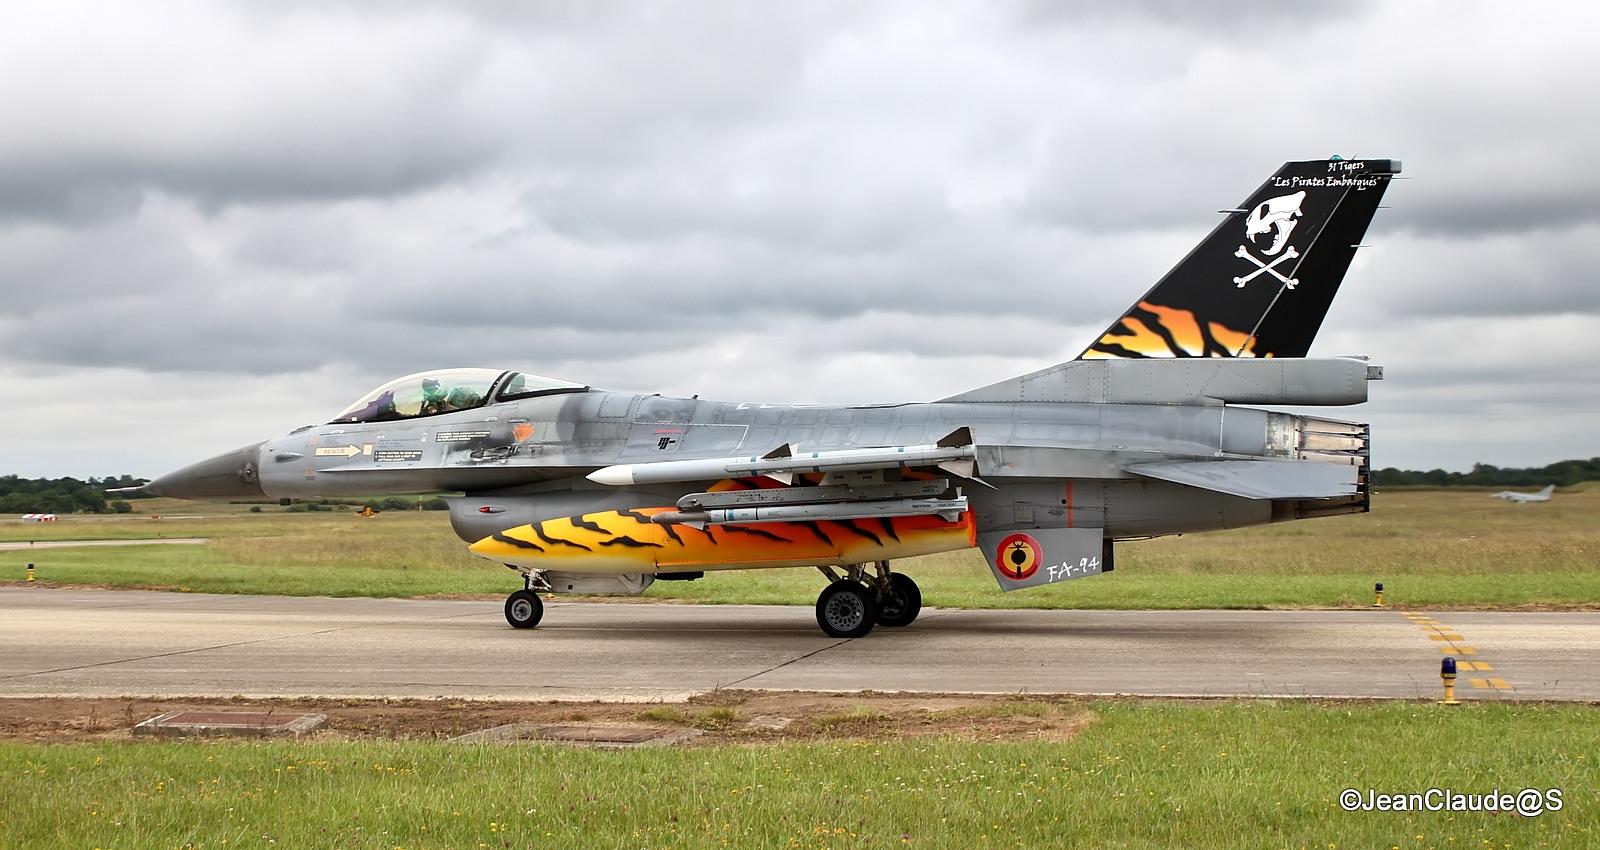 NATO Tiger Meet 2017 Landivisiau Img_0322_filtered-526f4bc